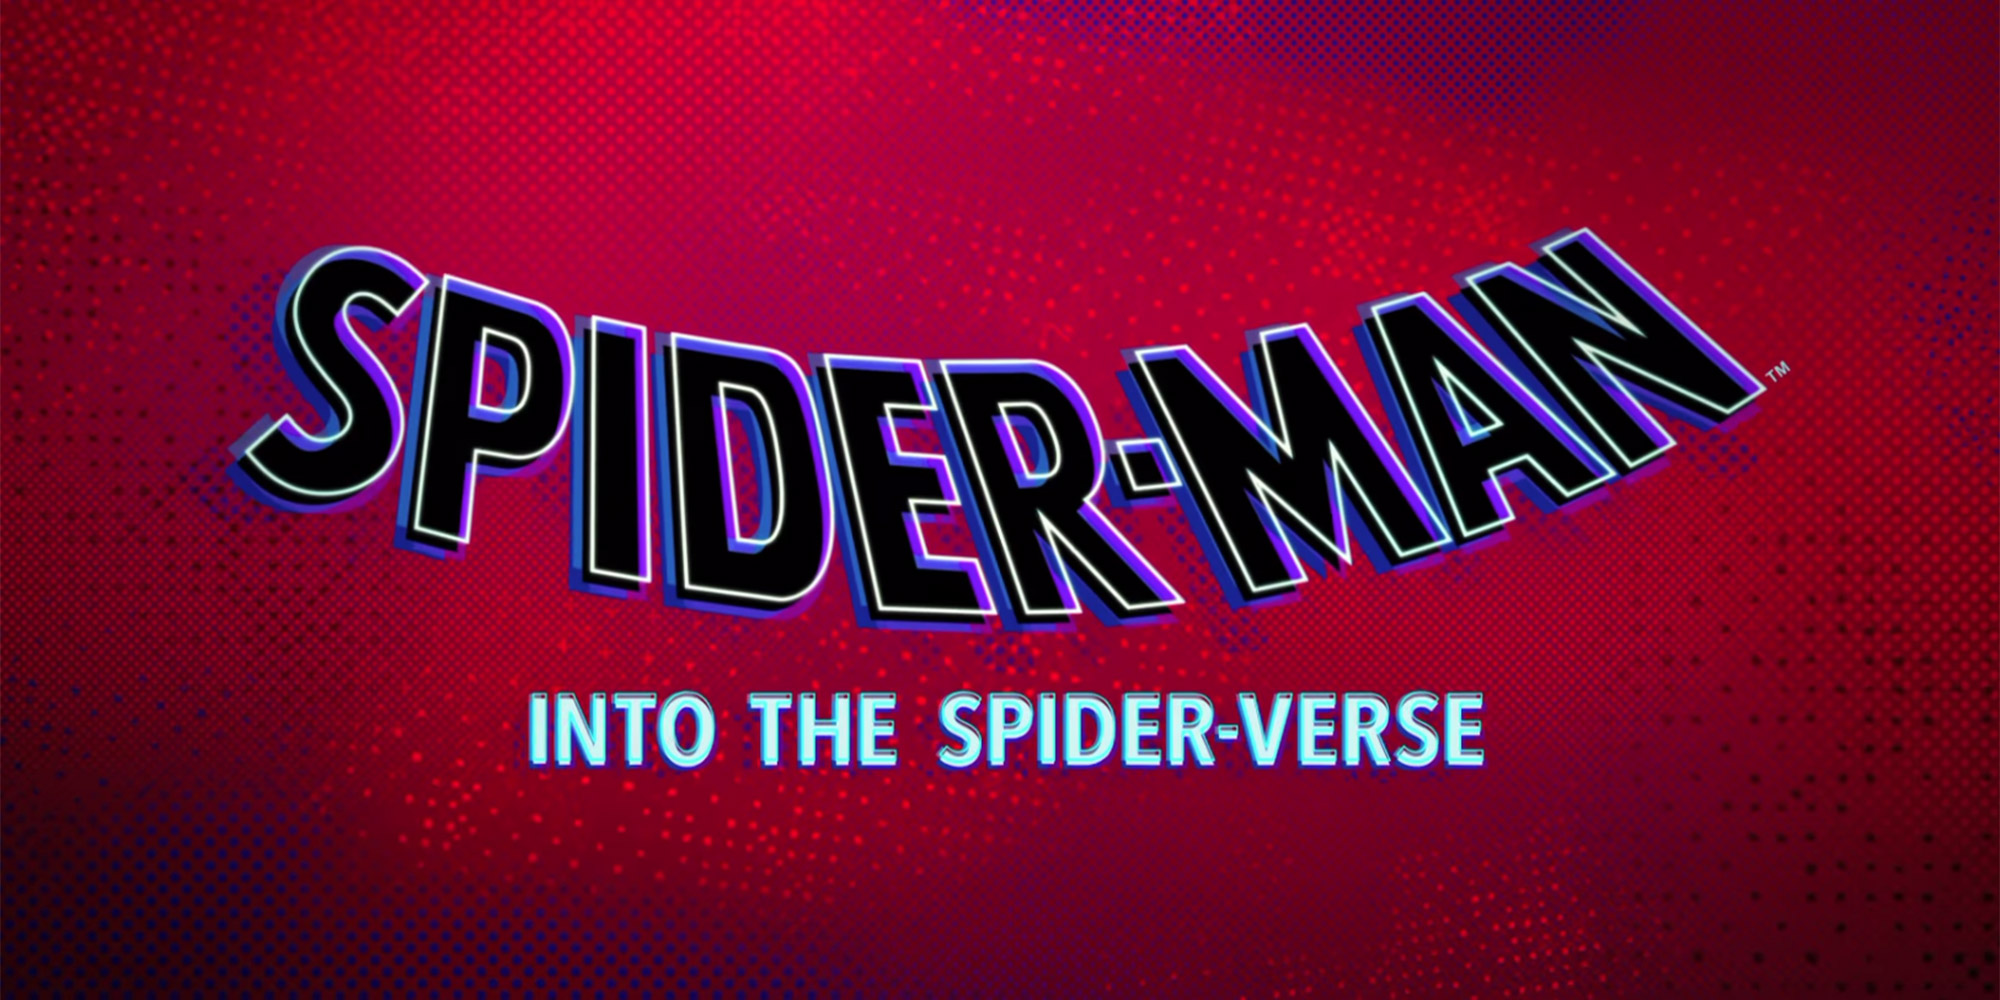 Trailer officiel pour SPIDER-MAN: INTO THE SPIDER-VERSE